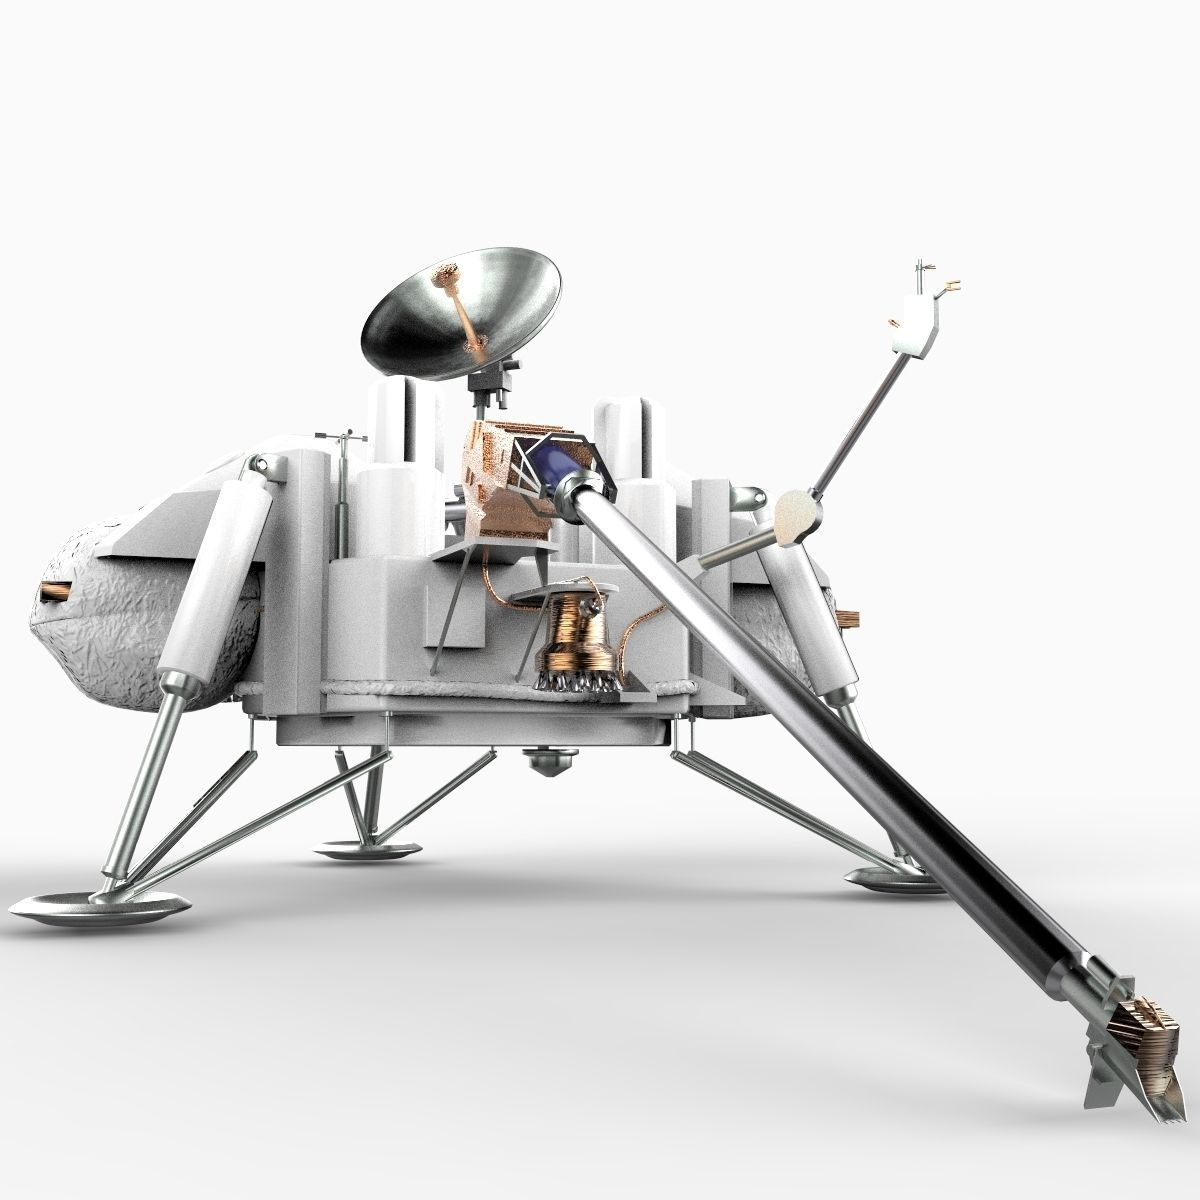 mars landing spacecraft - photo #35